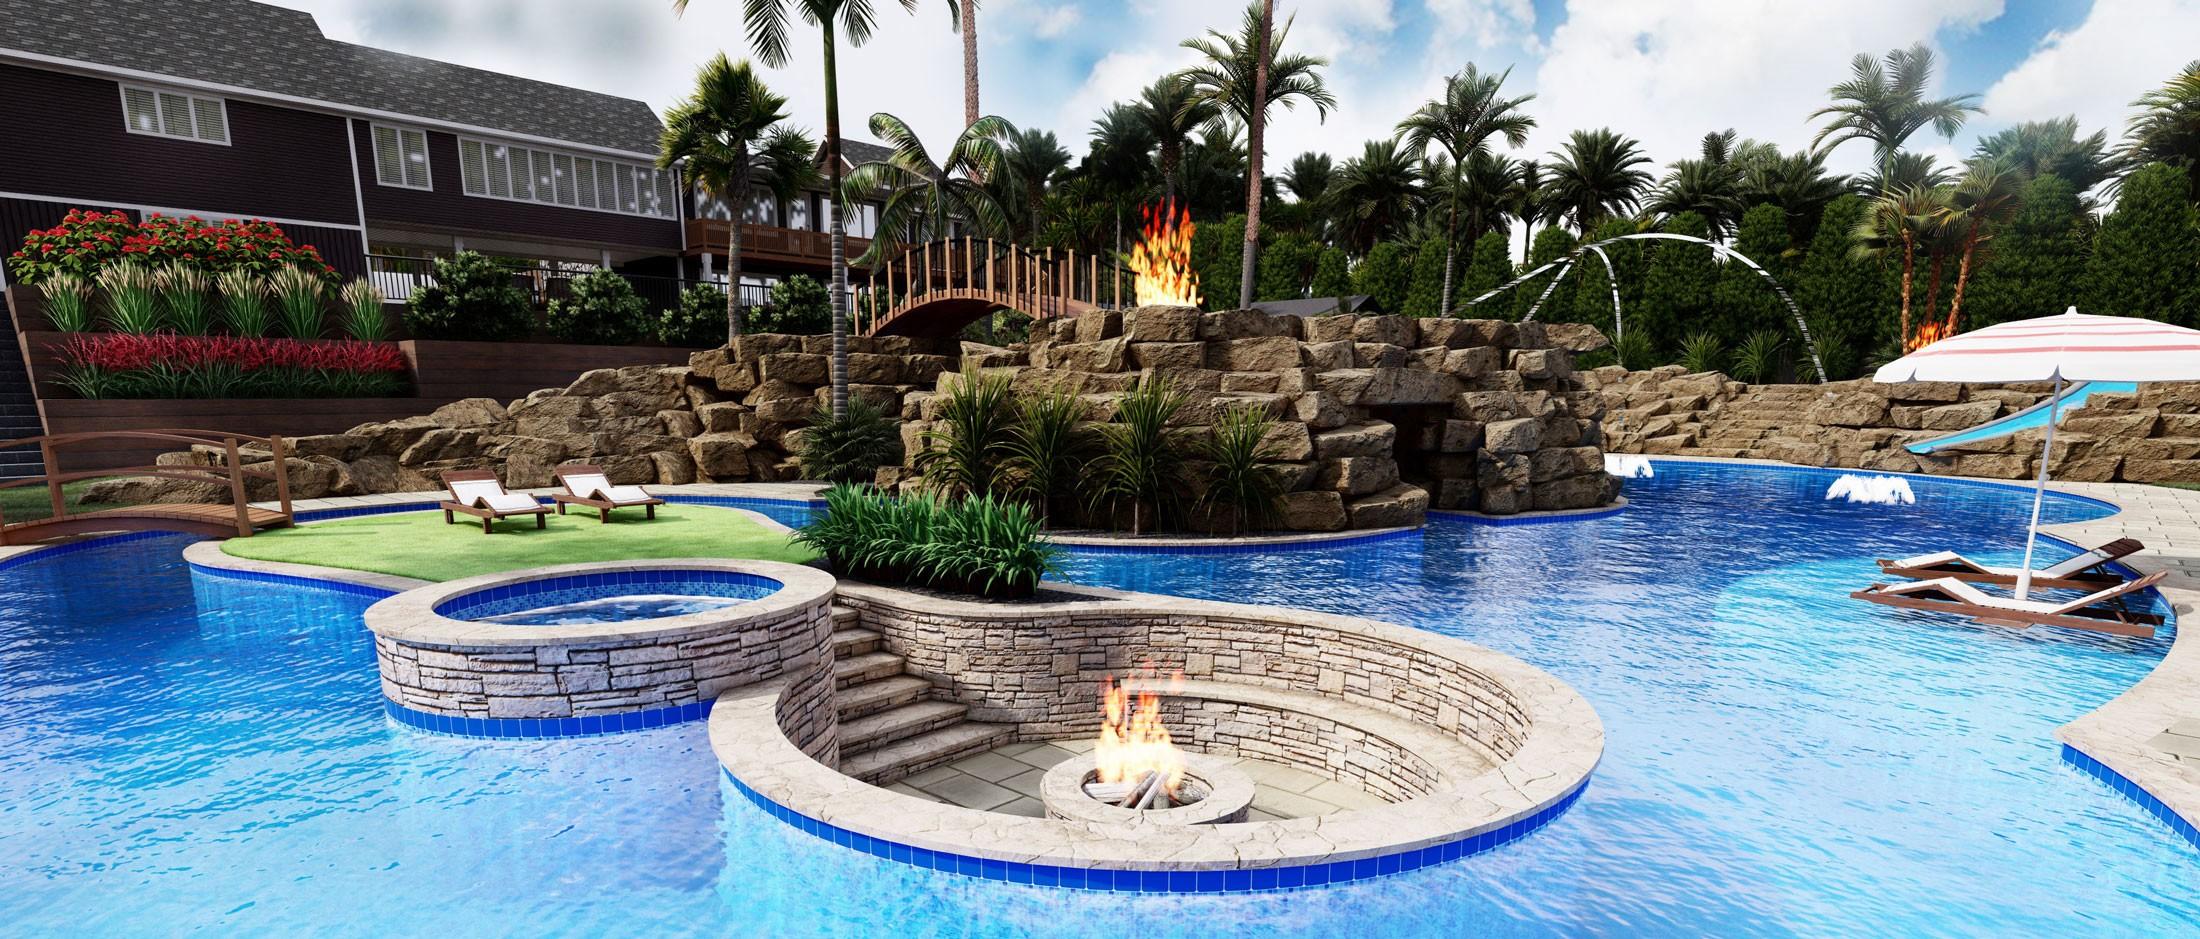 3d pool design mockup tool outdoor